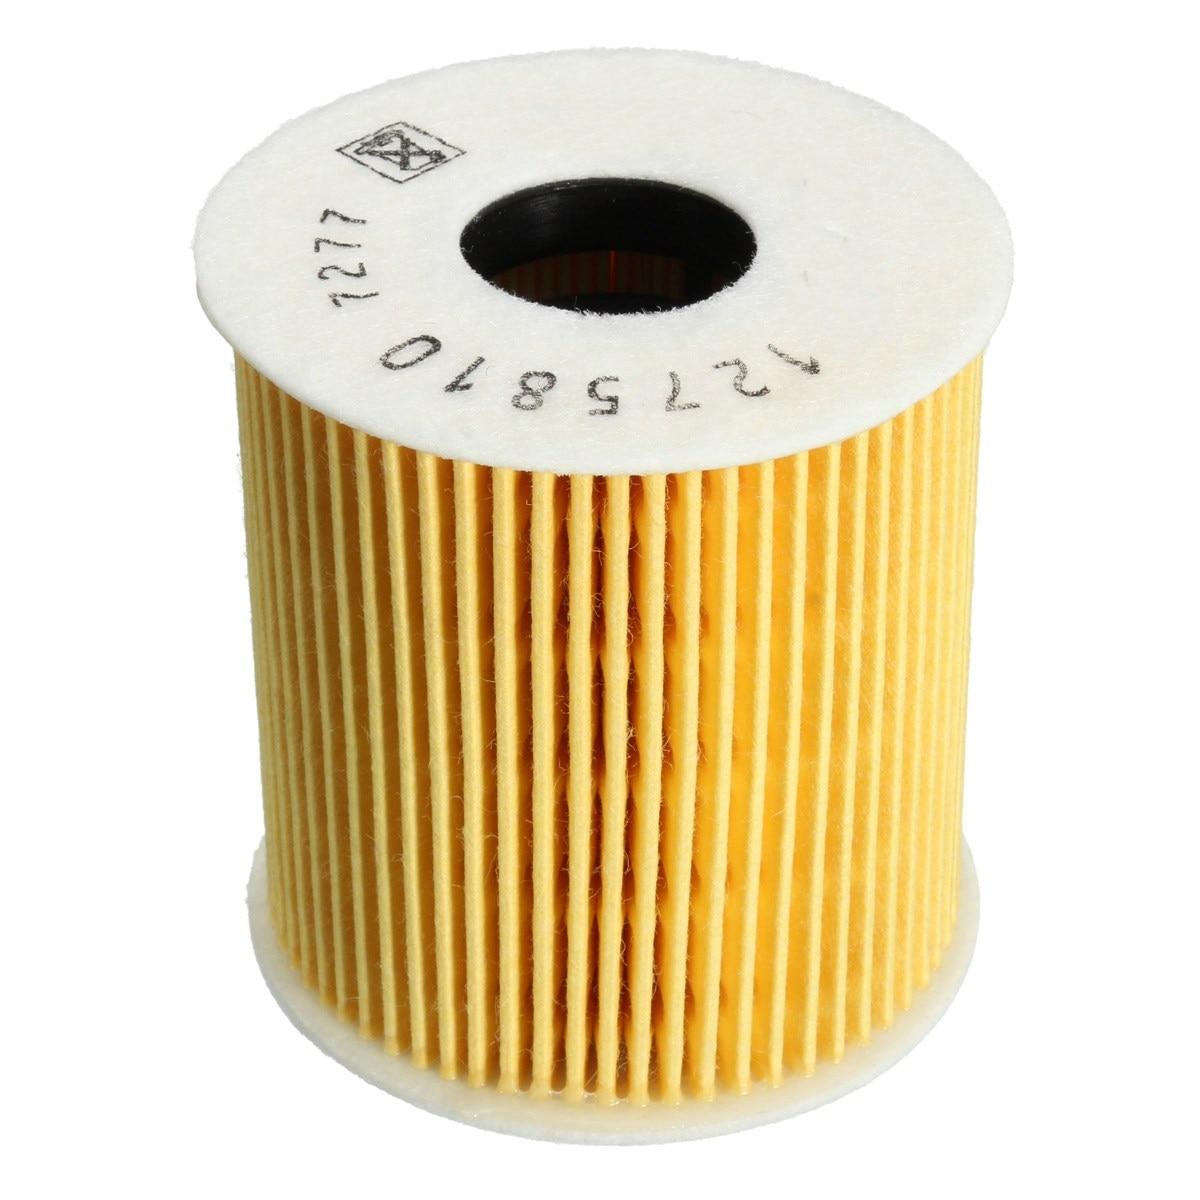 Elemento de papel de filtro de aceite amarillo arandela 1275810 para Volvo XC70 XC 90 V70 V40 S80 S70 S60